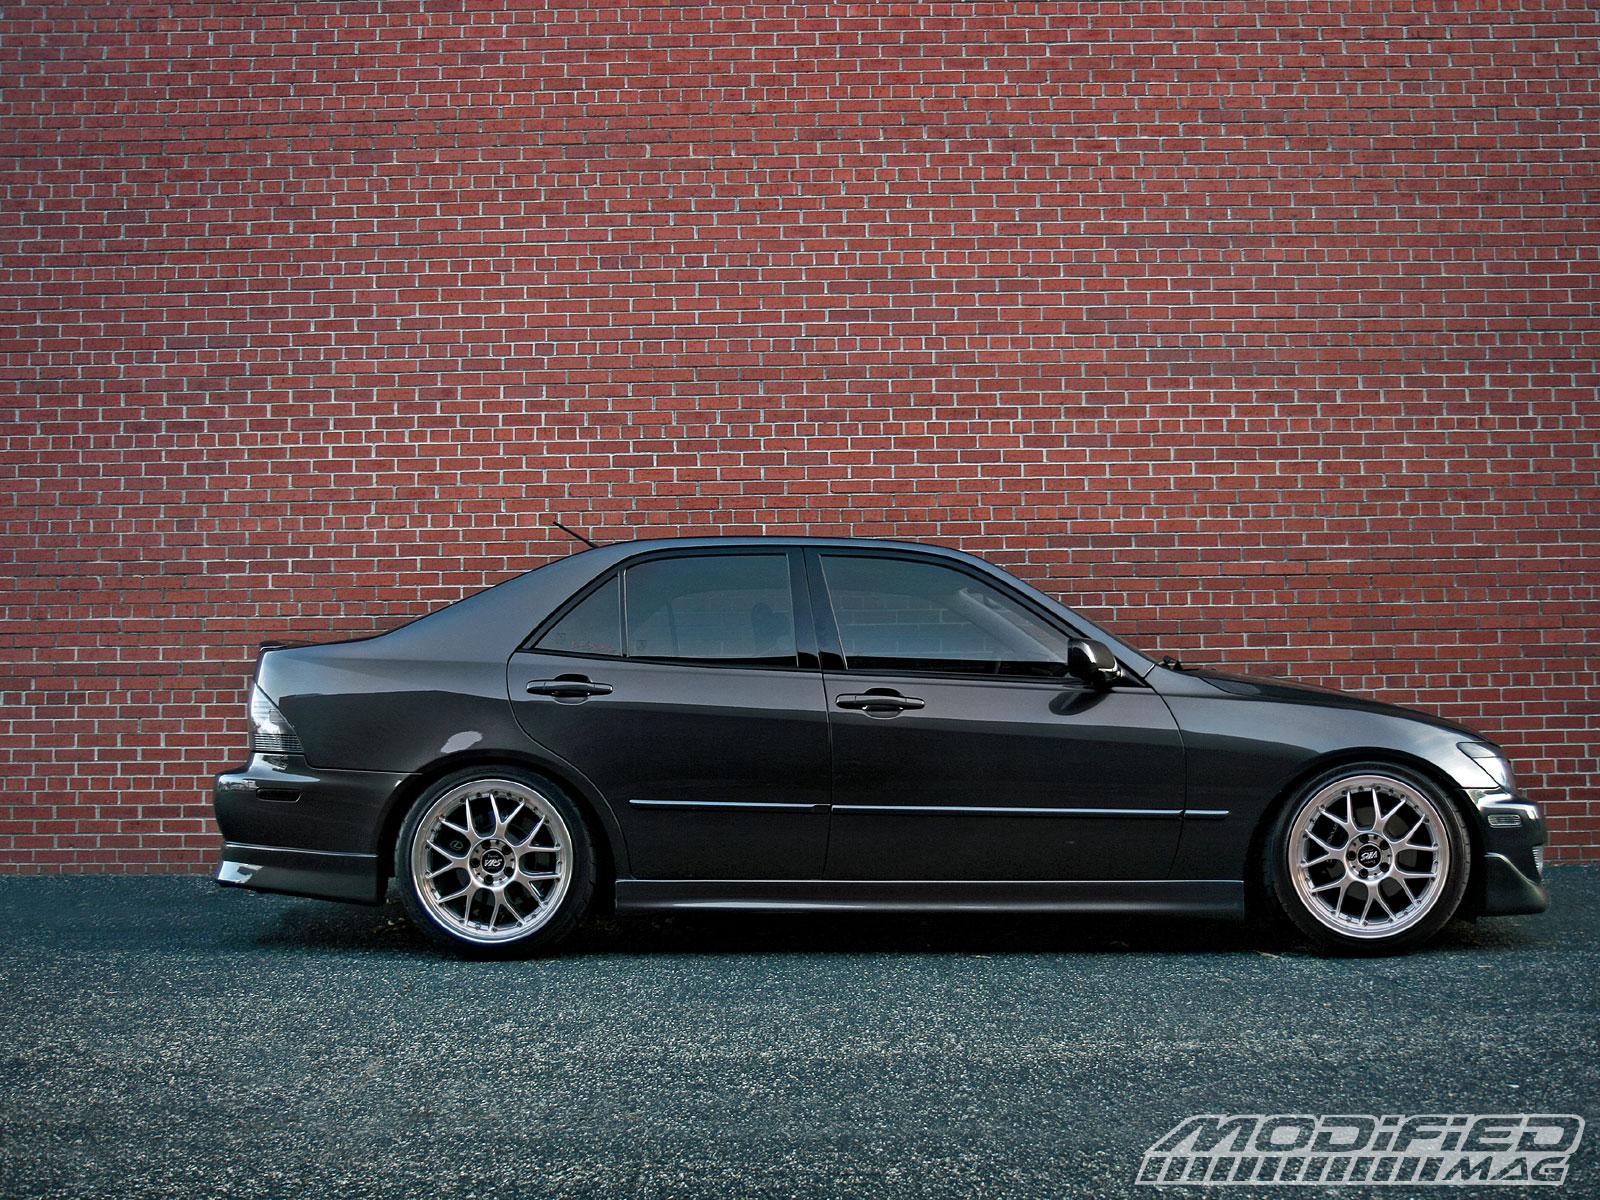 Lexus >> 2004 LEXUS IS 300 - Image #15